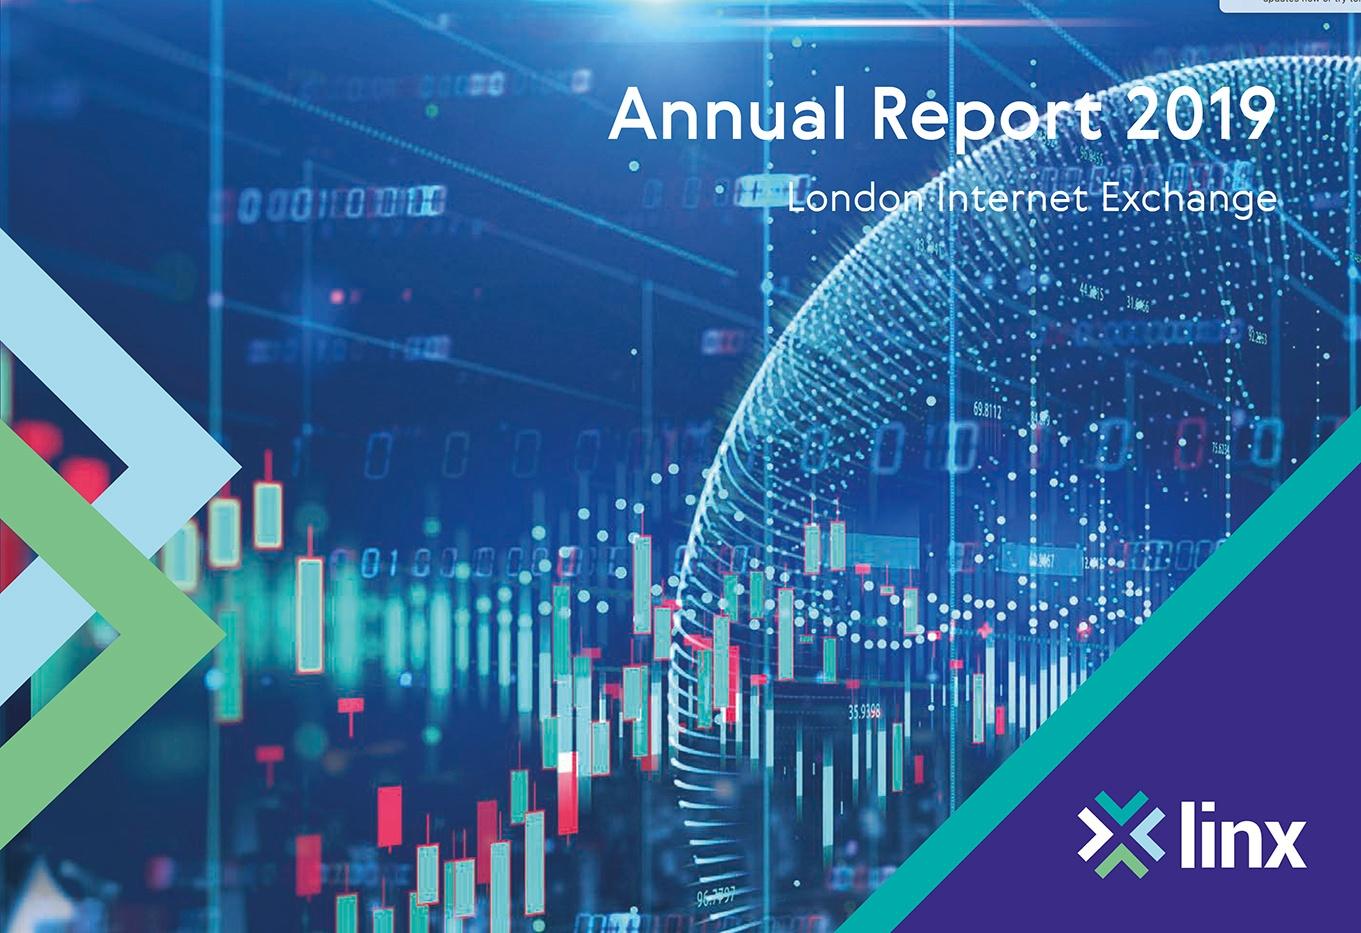 Annual-Report-2019-cover